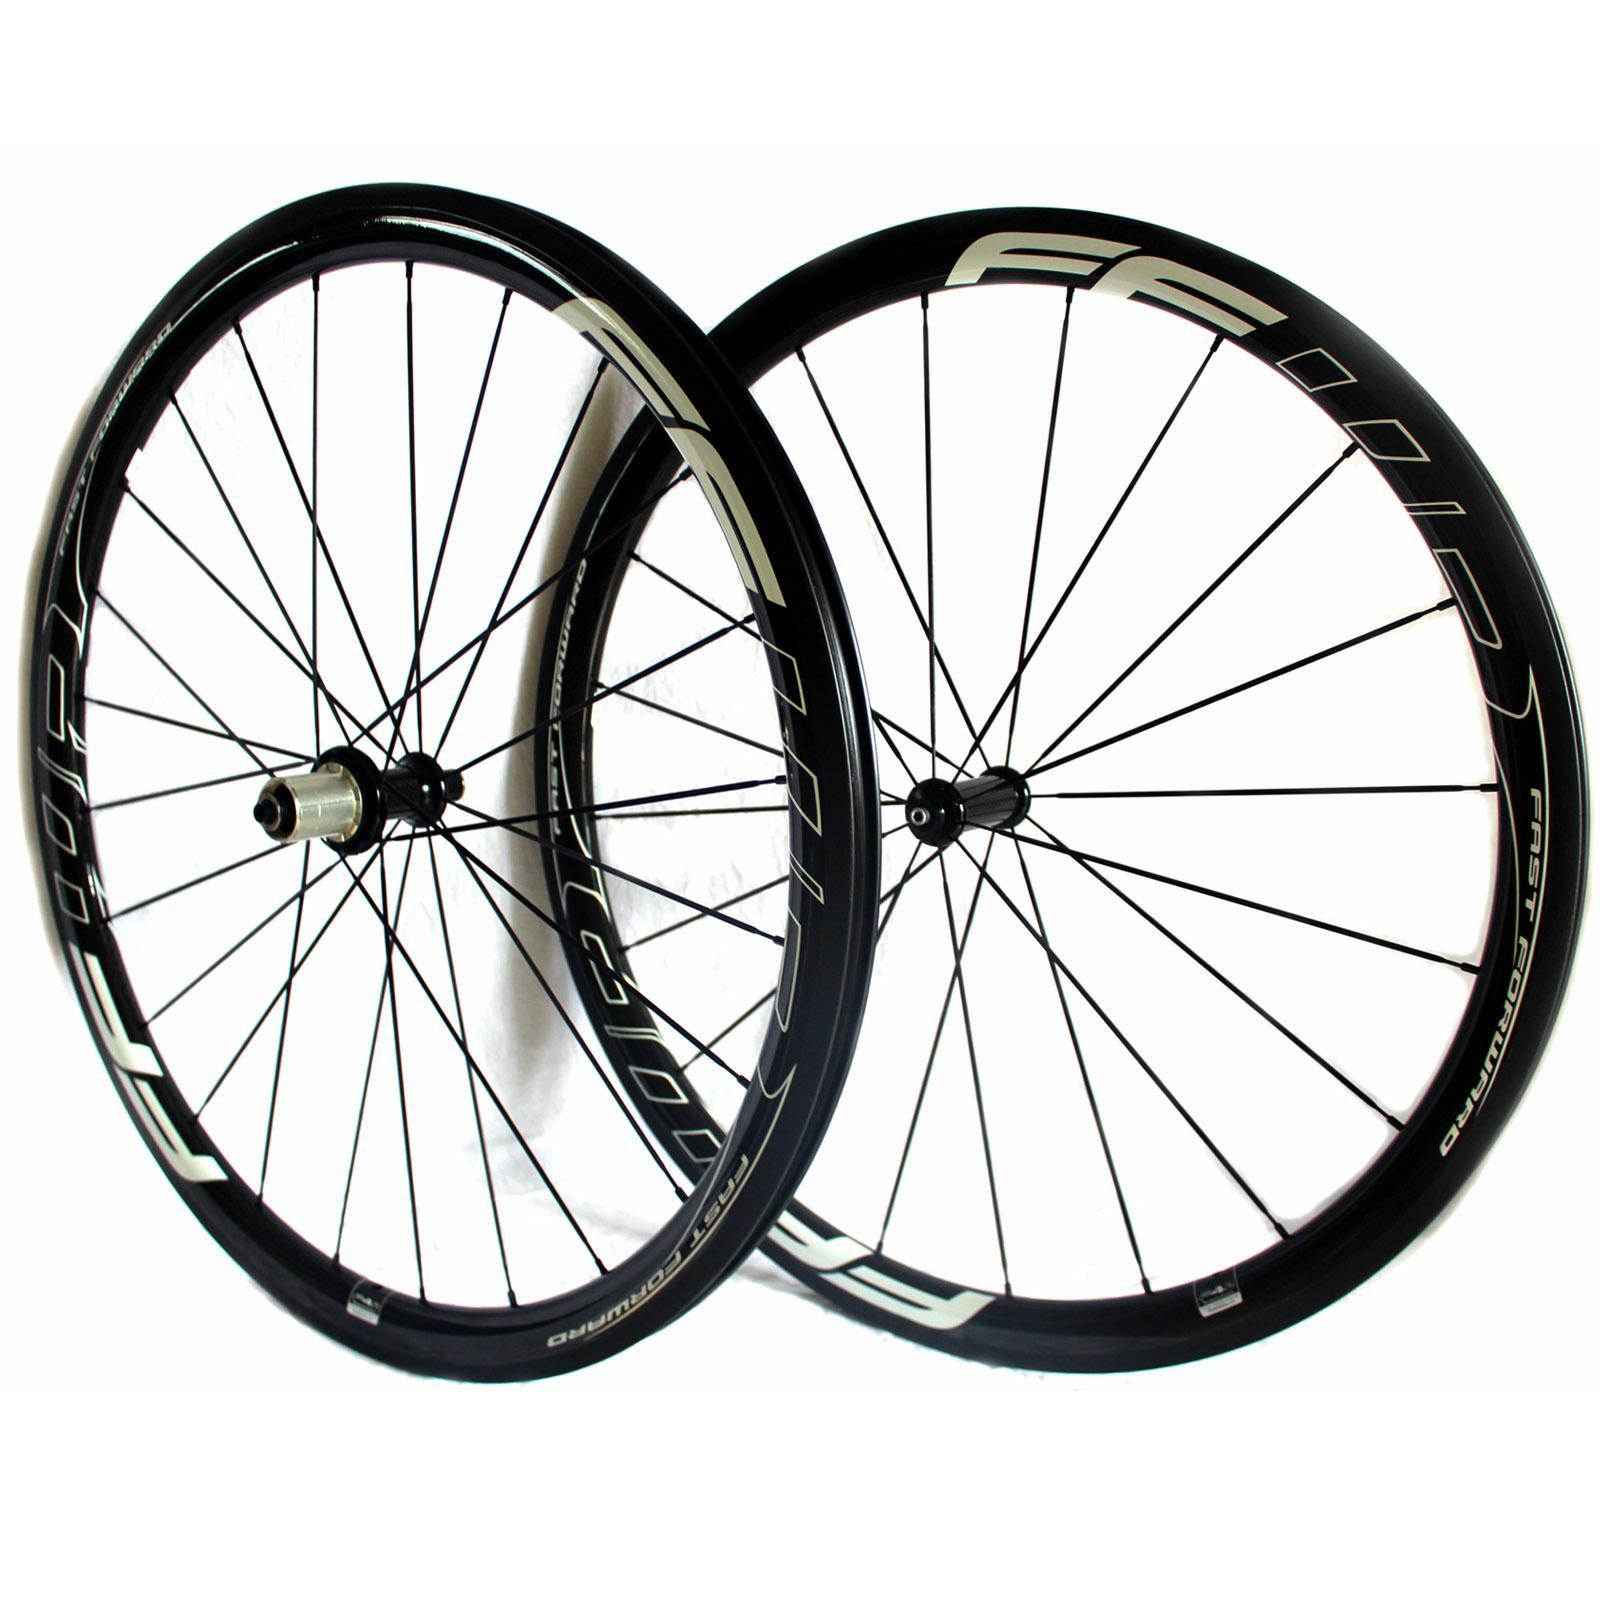 FFWD 빨리 감기 F4R의 38mm 탄소 자전거 바퀴 powerway R36 허브 현무암 표면 광택 3K 제동 바퀴 관 도로 자전거를 CLINCHER